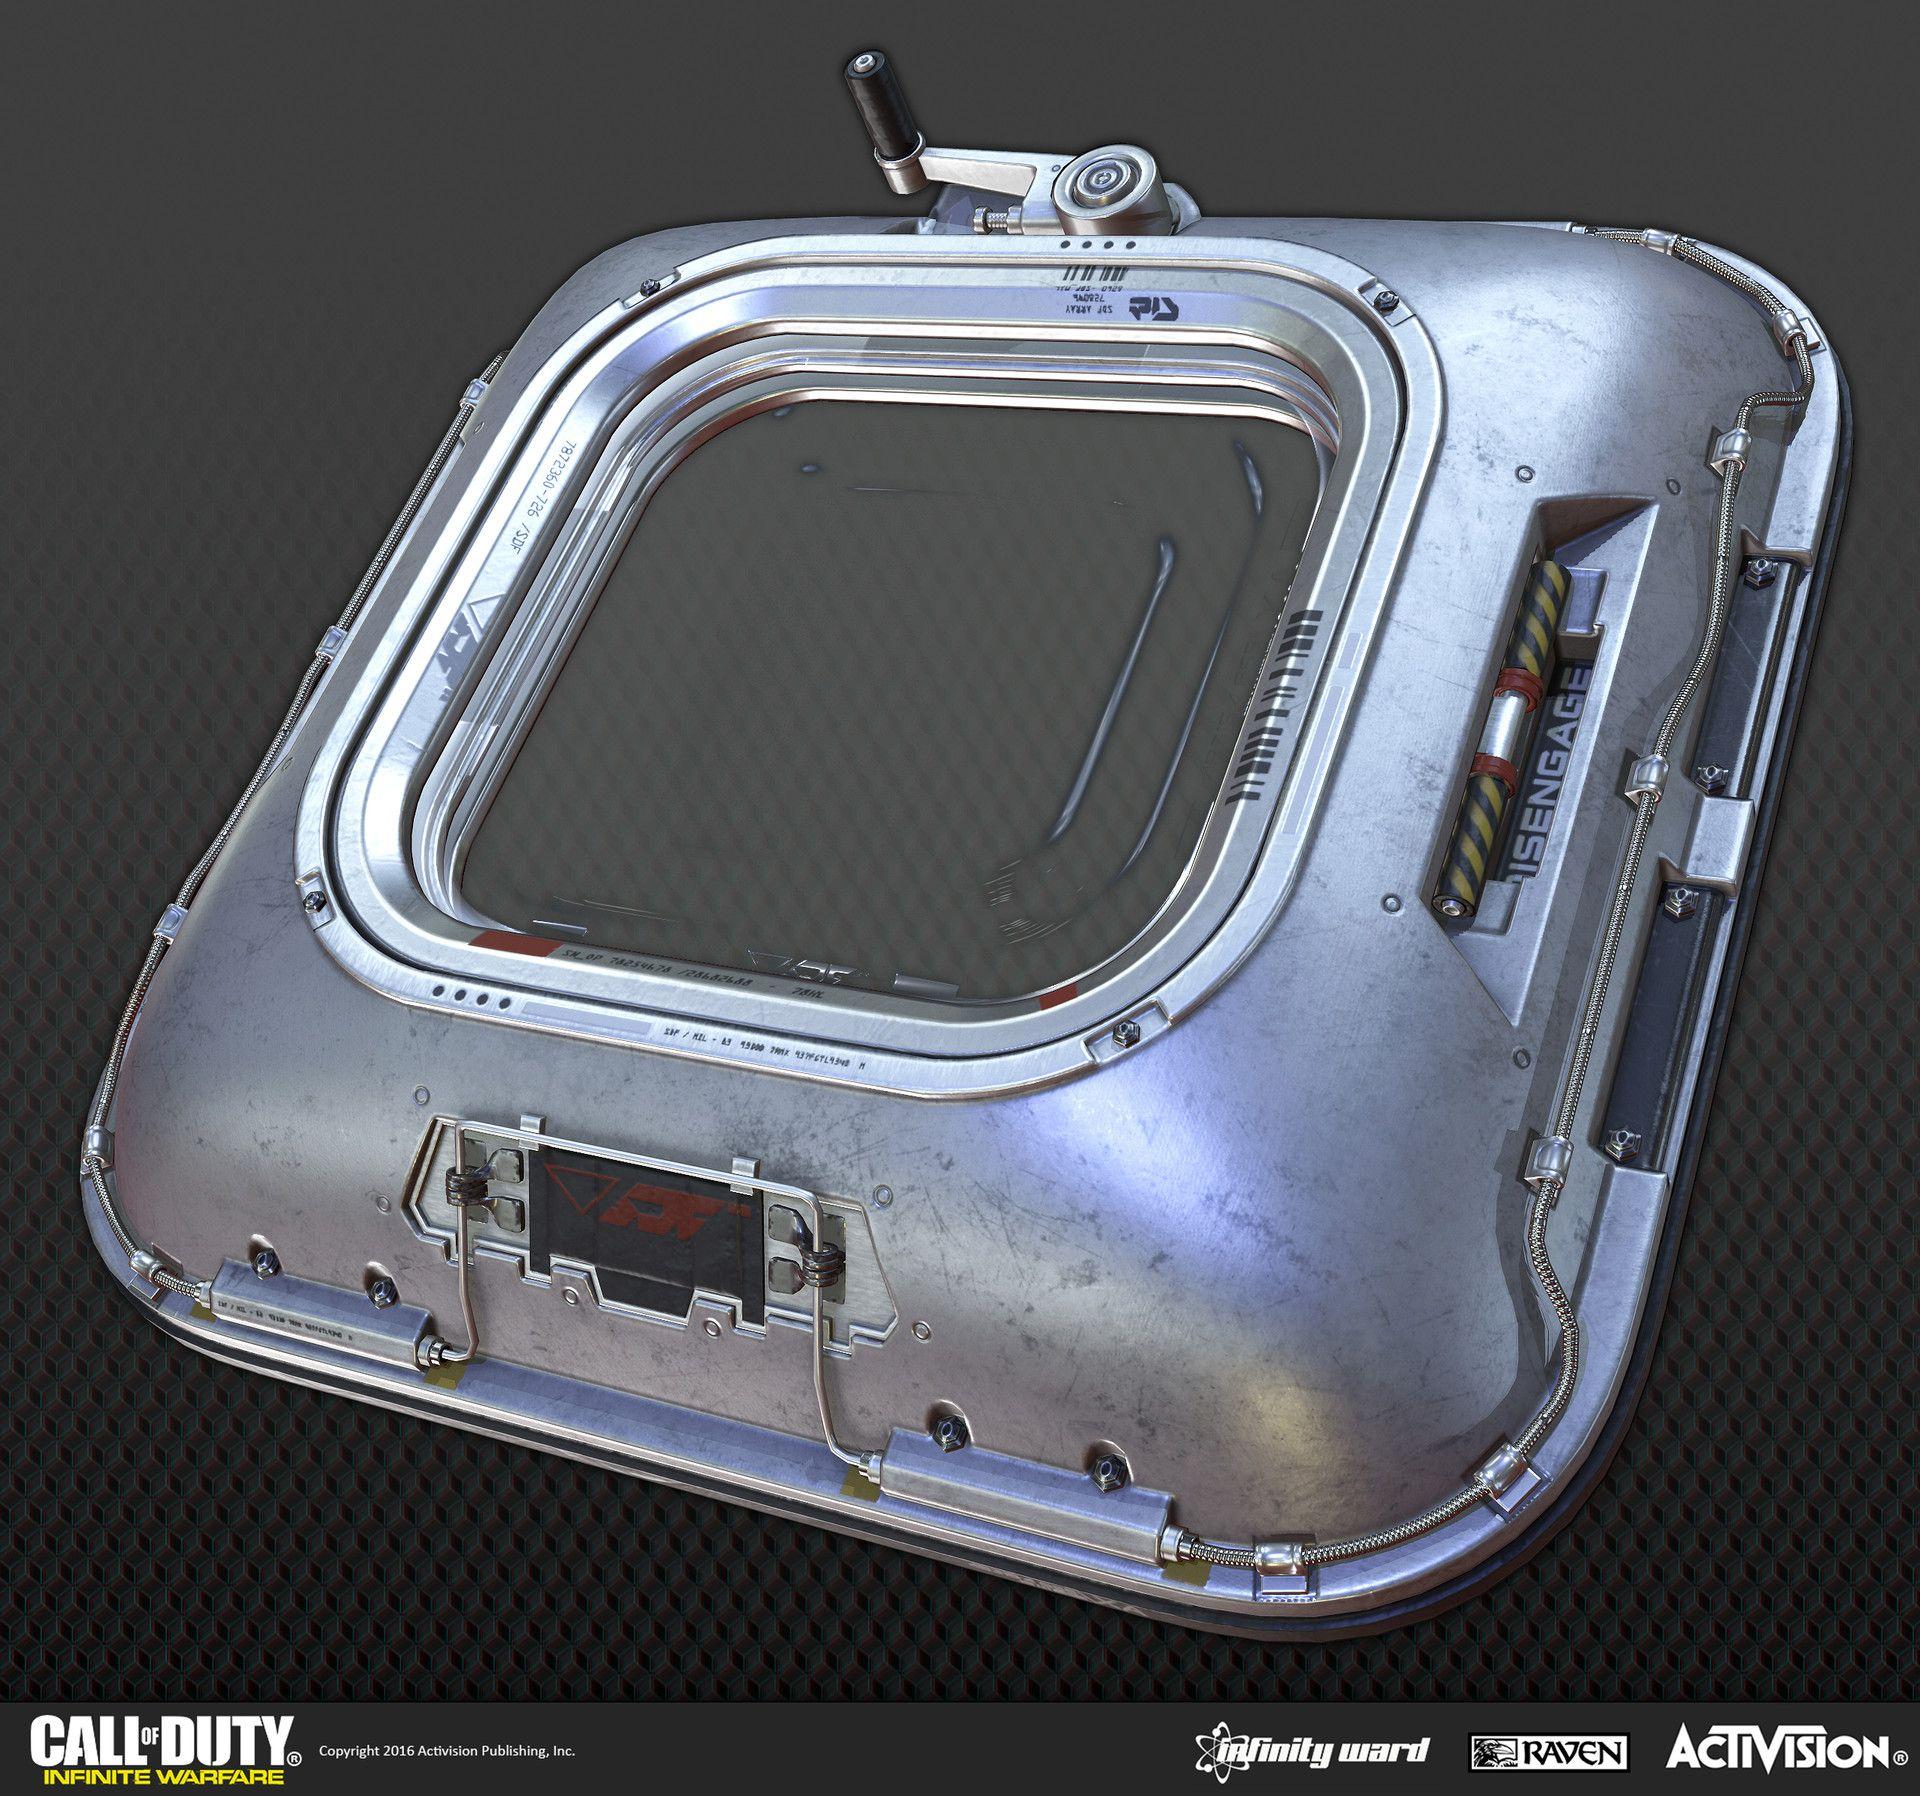 Artstation call of duty infinite warefare ship assaults alex kreeger sci fi hallway - Infinite warfare ship assault ...